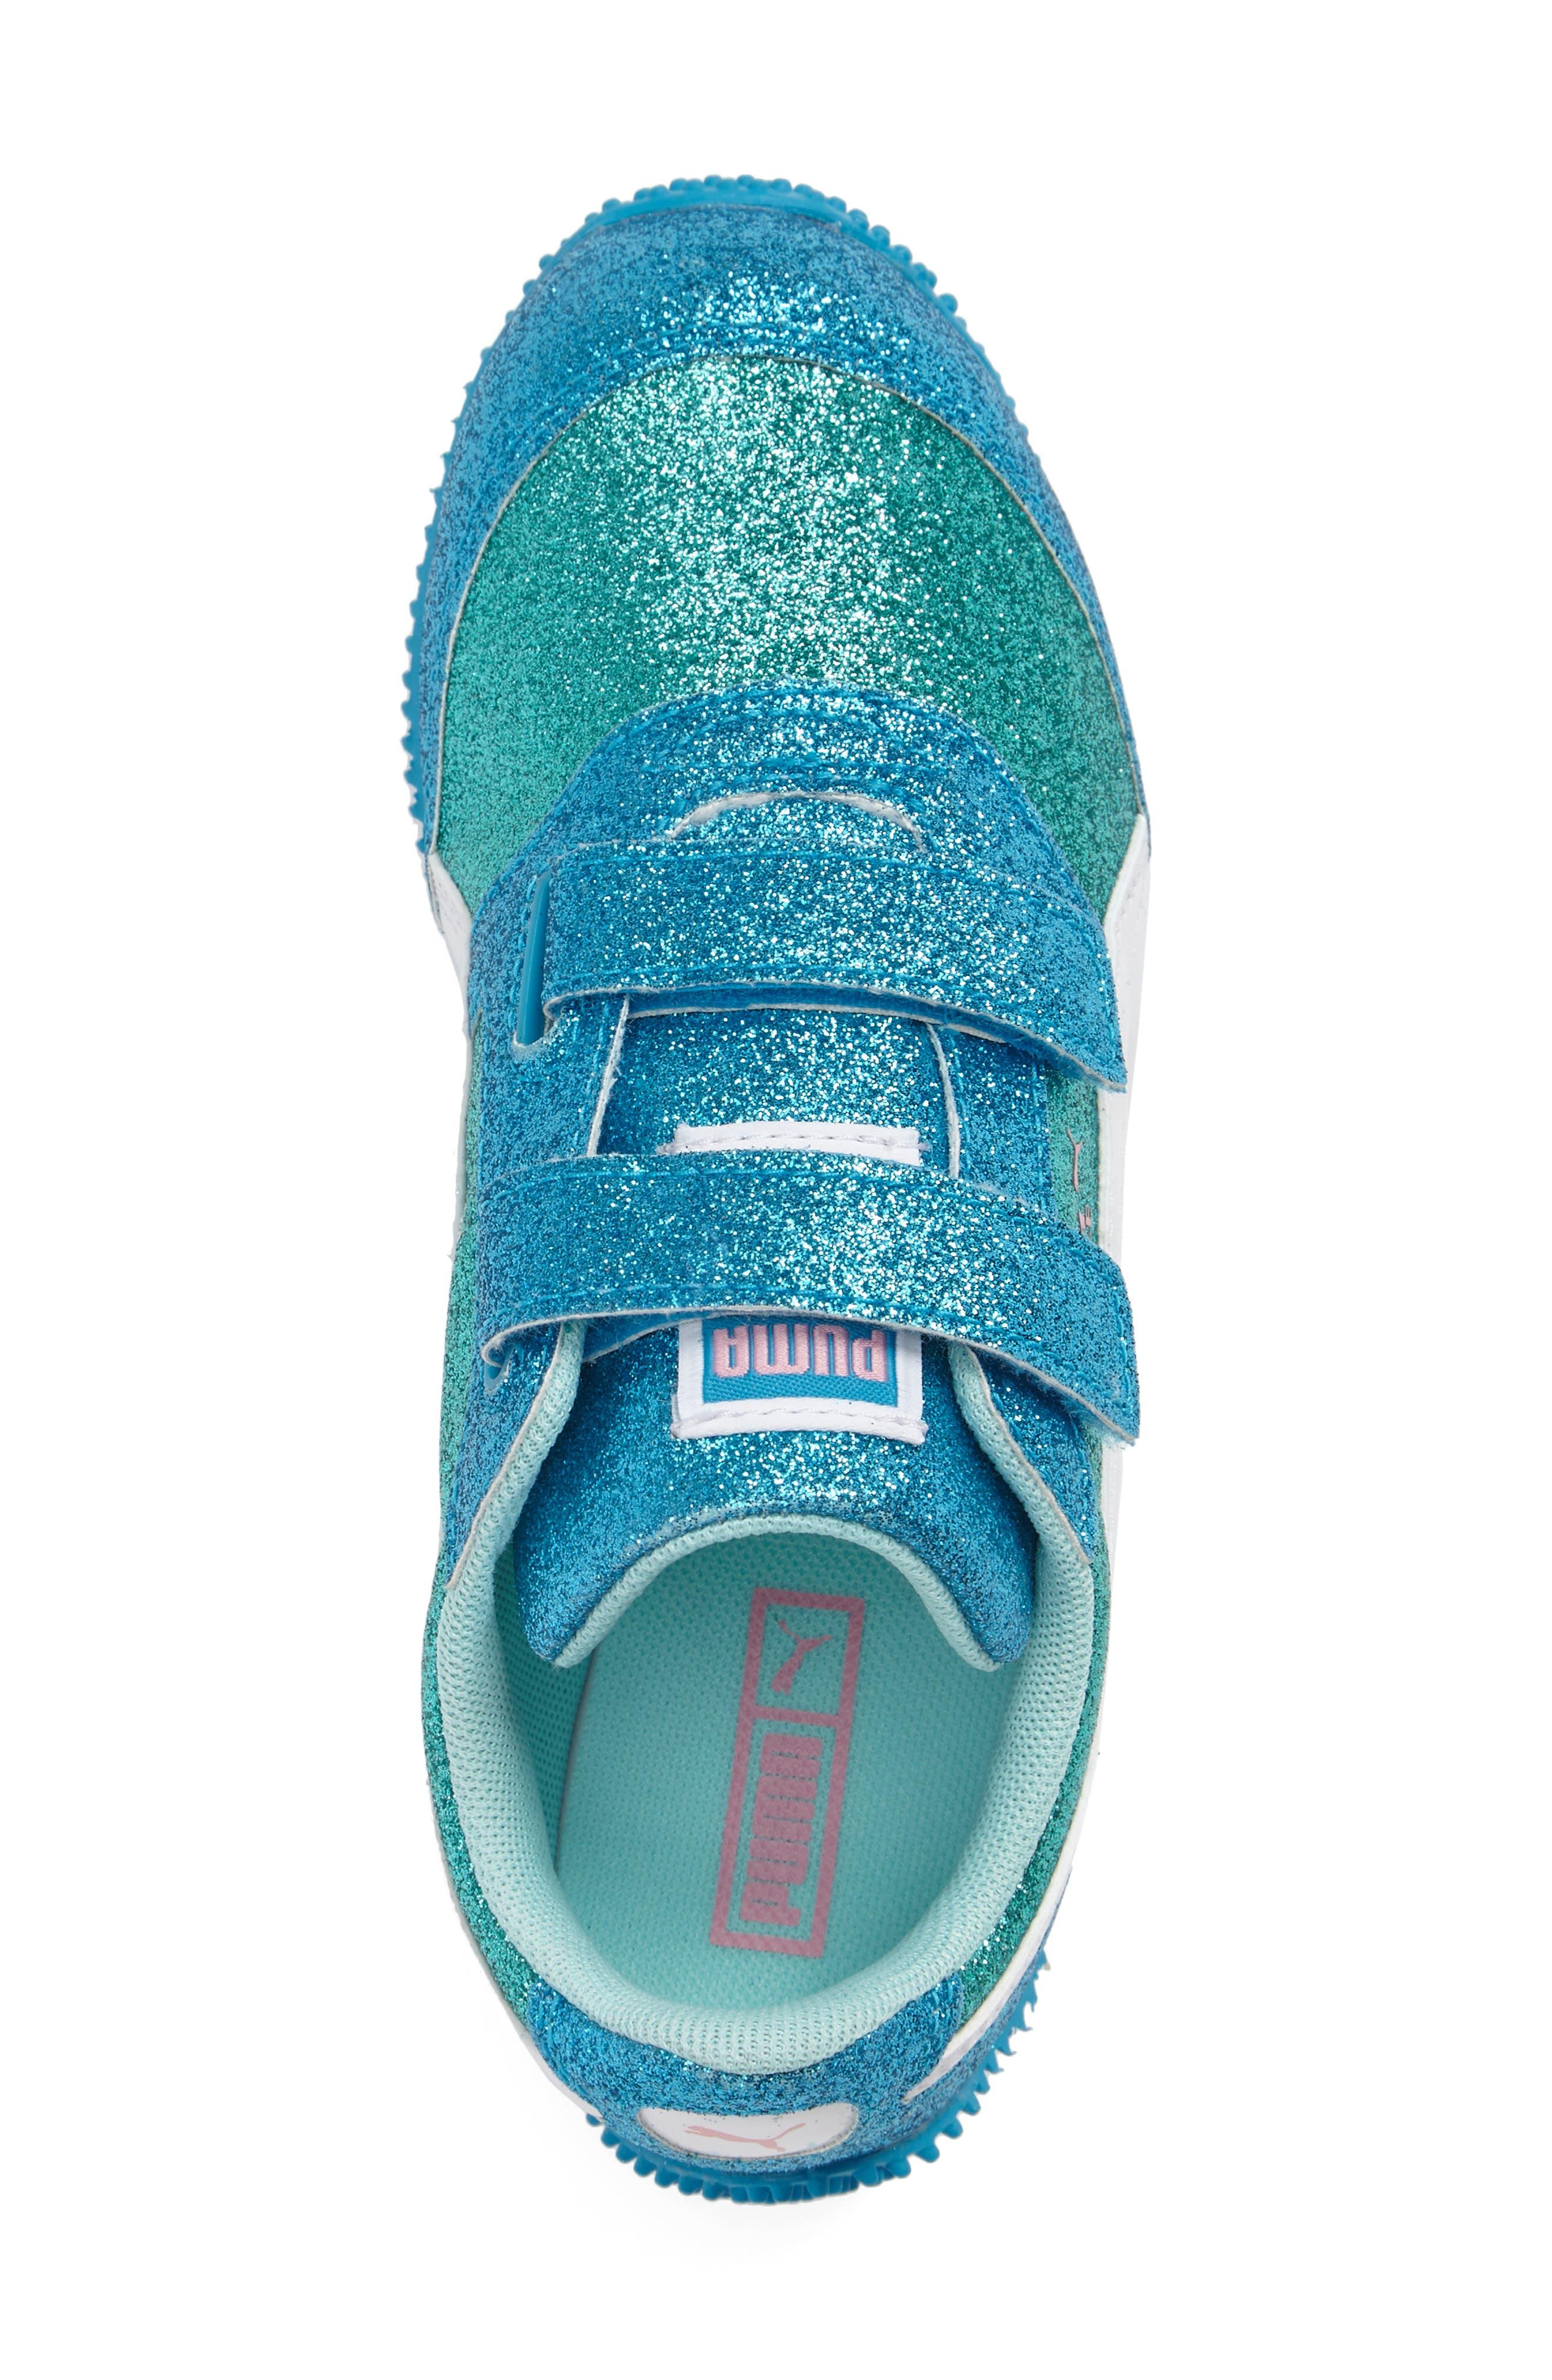 Alternate Image 3  - PUMA Steeple Glitz Glam Sneaker (Baby, Walker, Toddler, Little Kid & Big Kid)